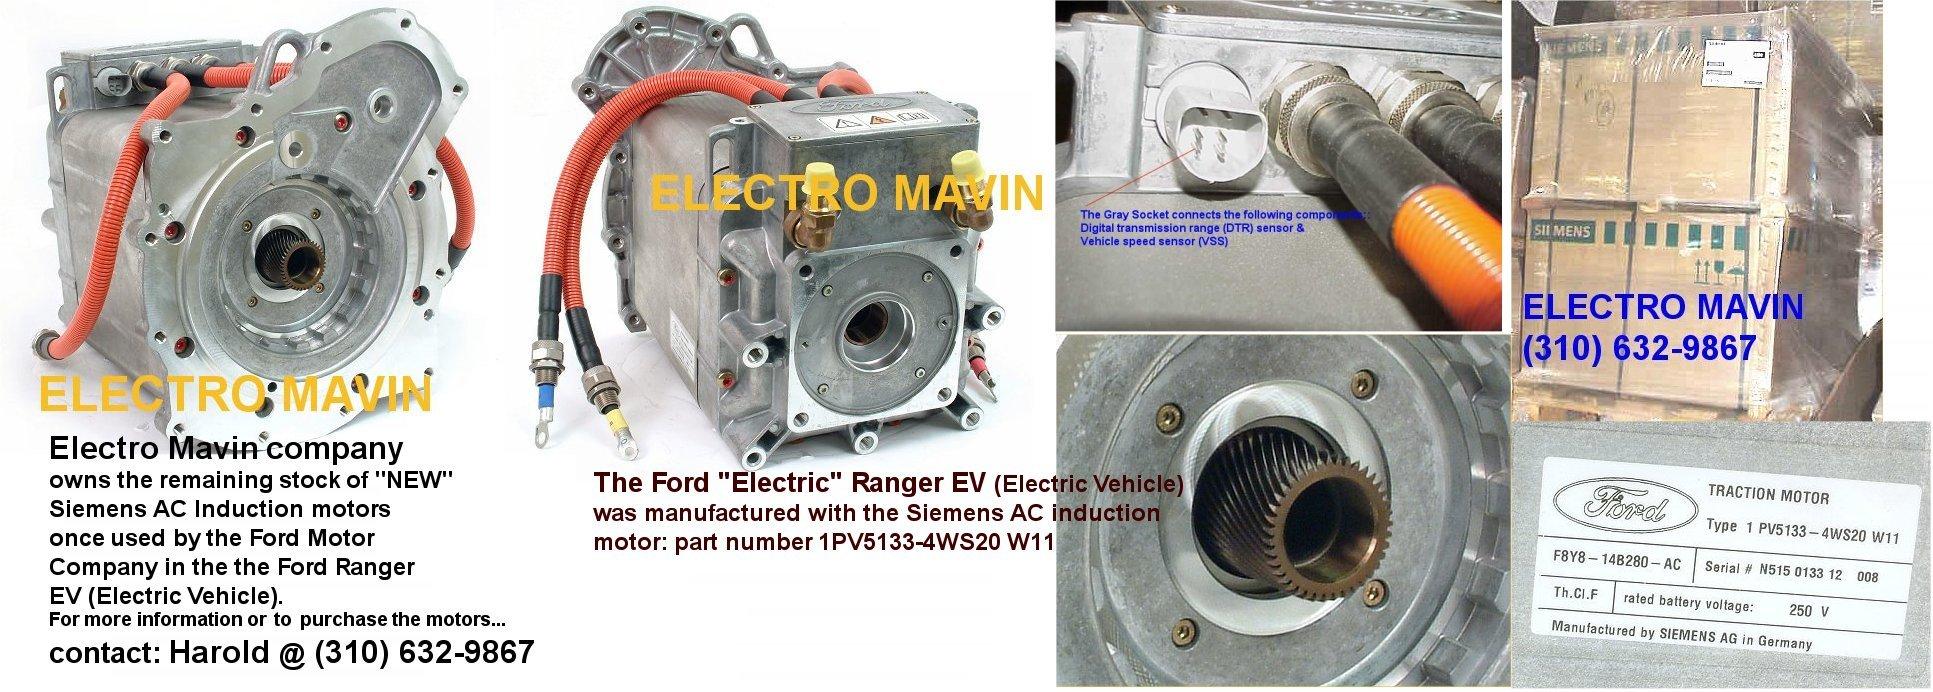 File Siemens Ford Ranger Ev Motor Wikipedia